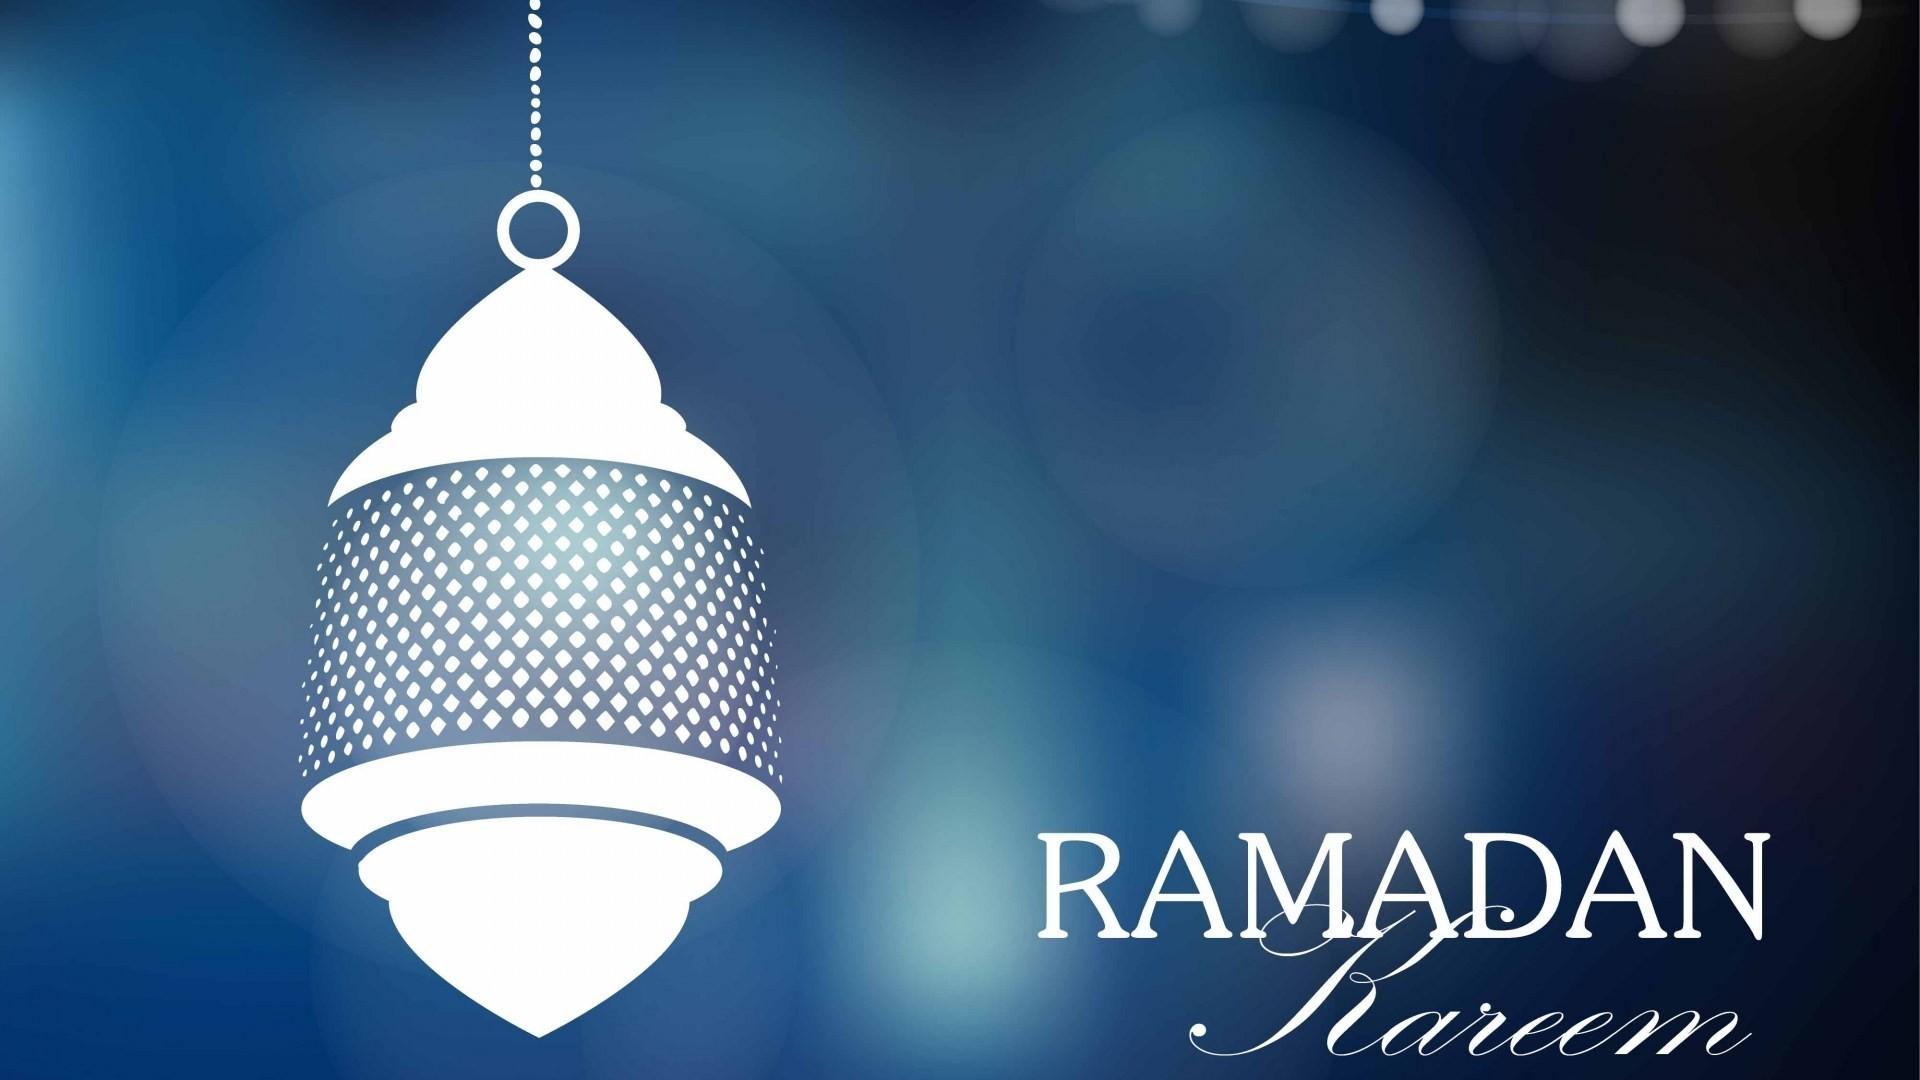 Рамазан жайлы бір сұхбат